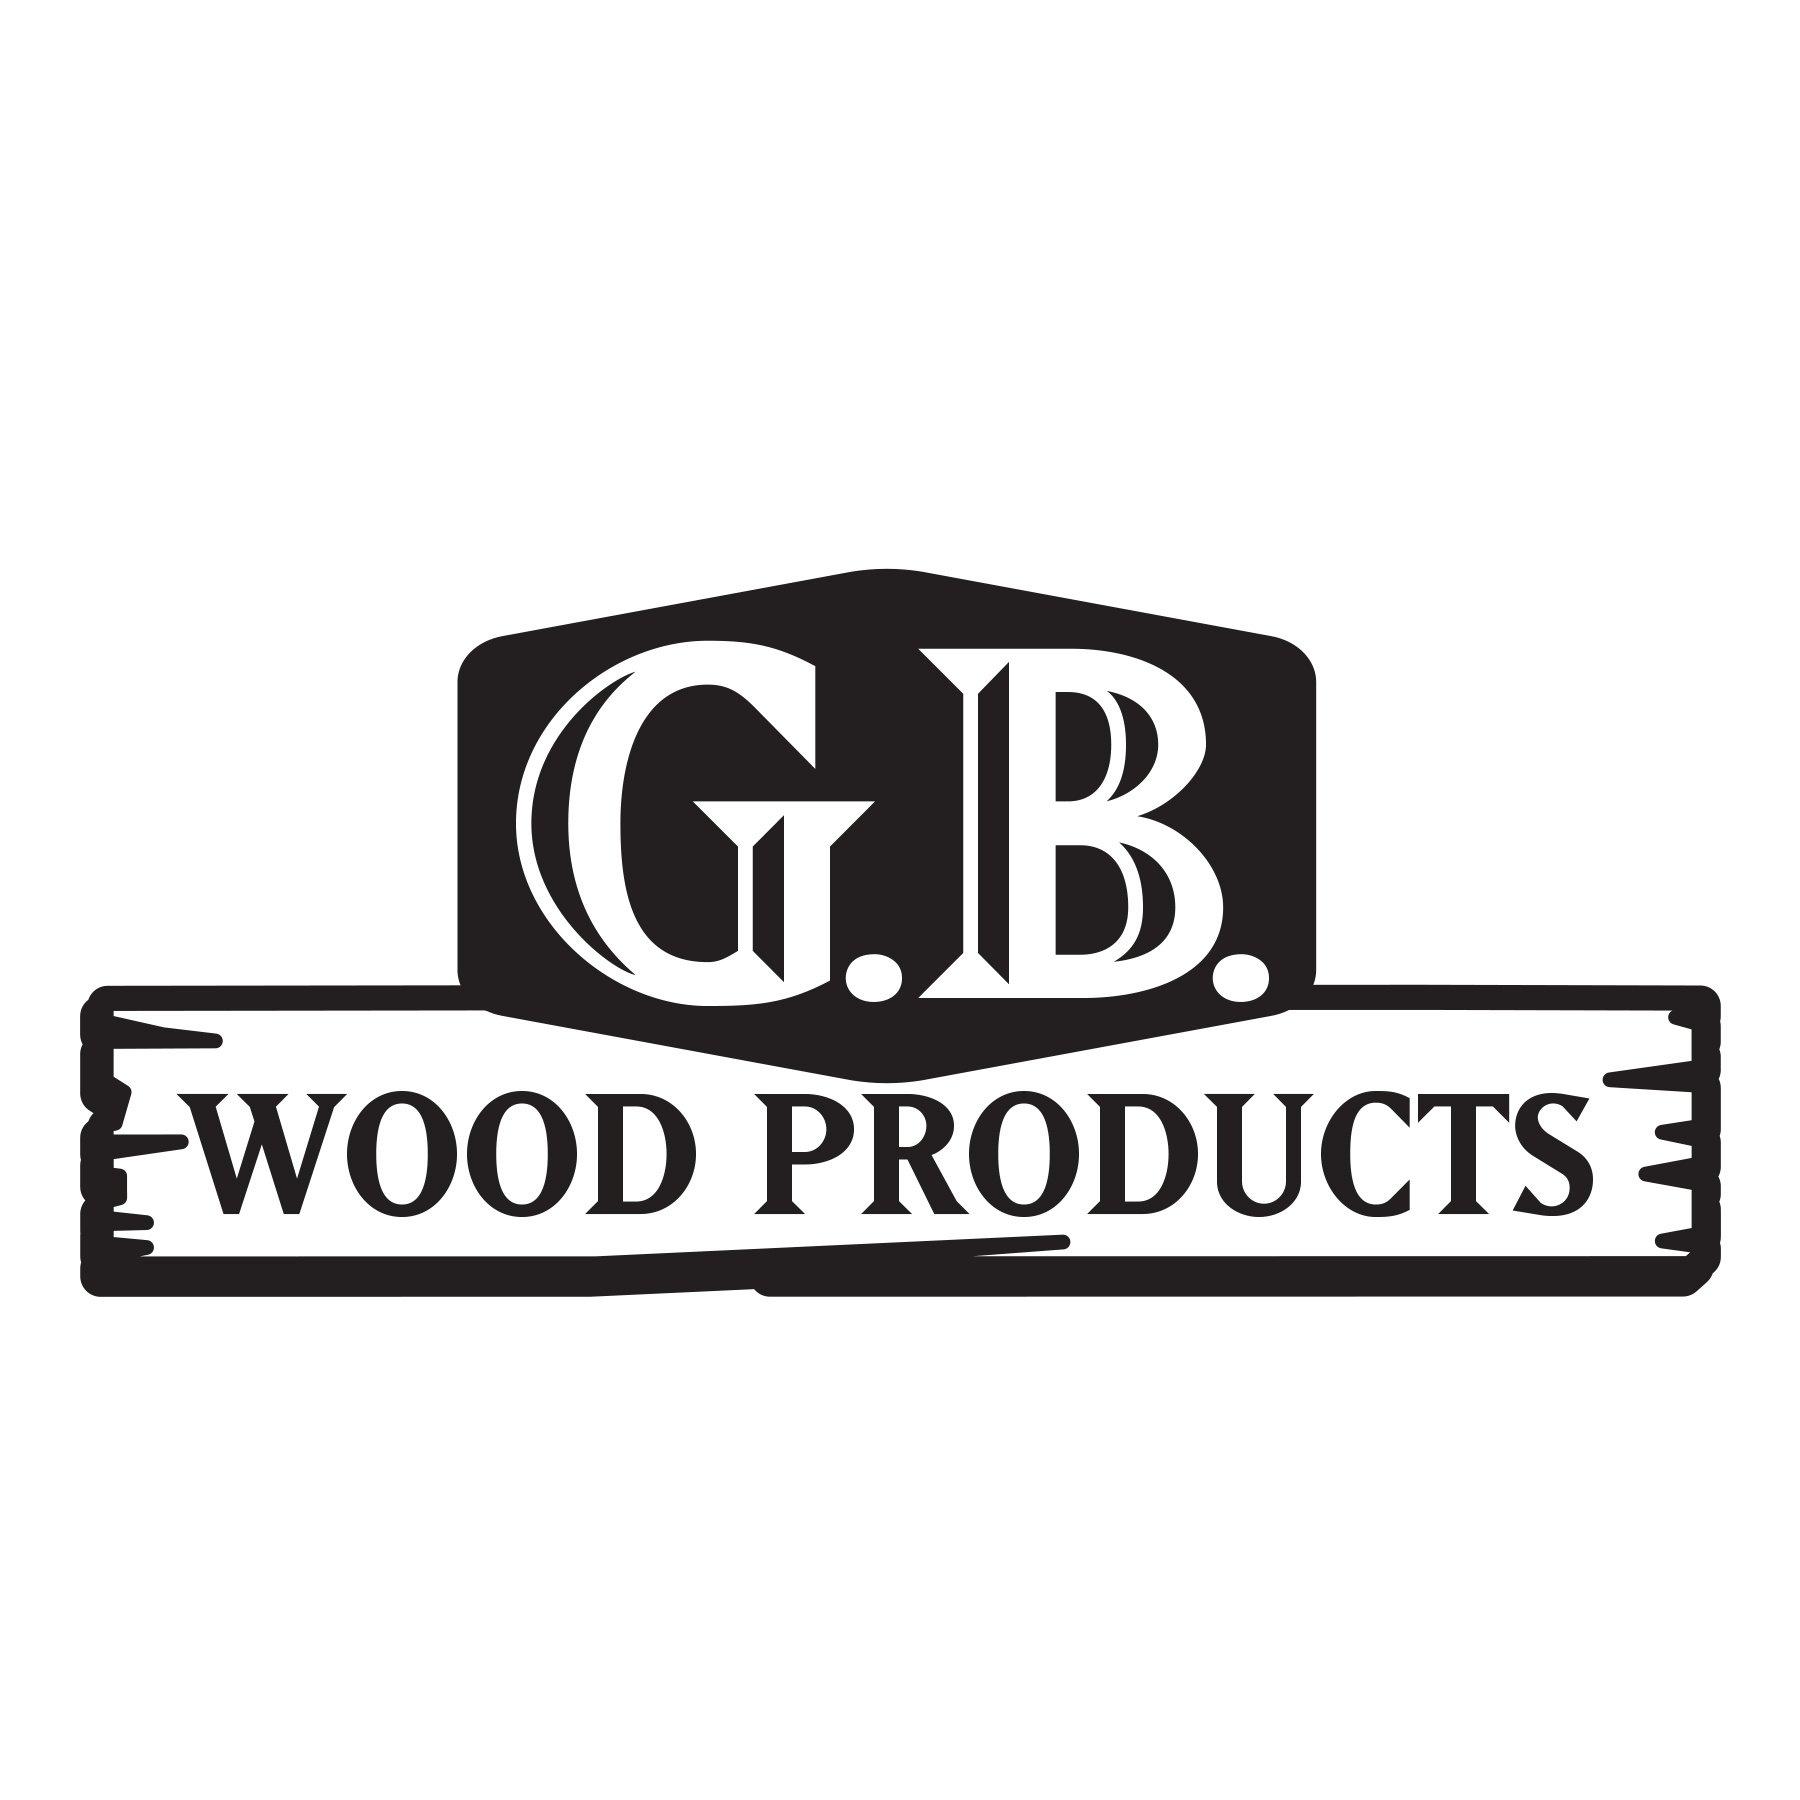 G.B. Wood Products Logo